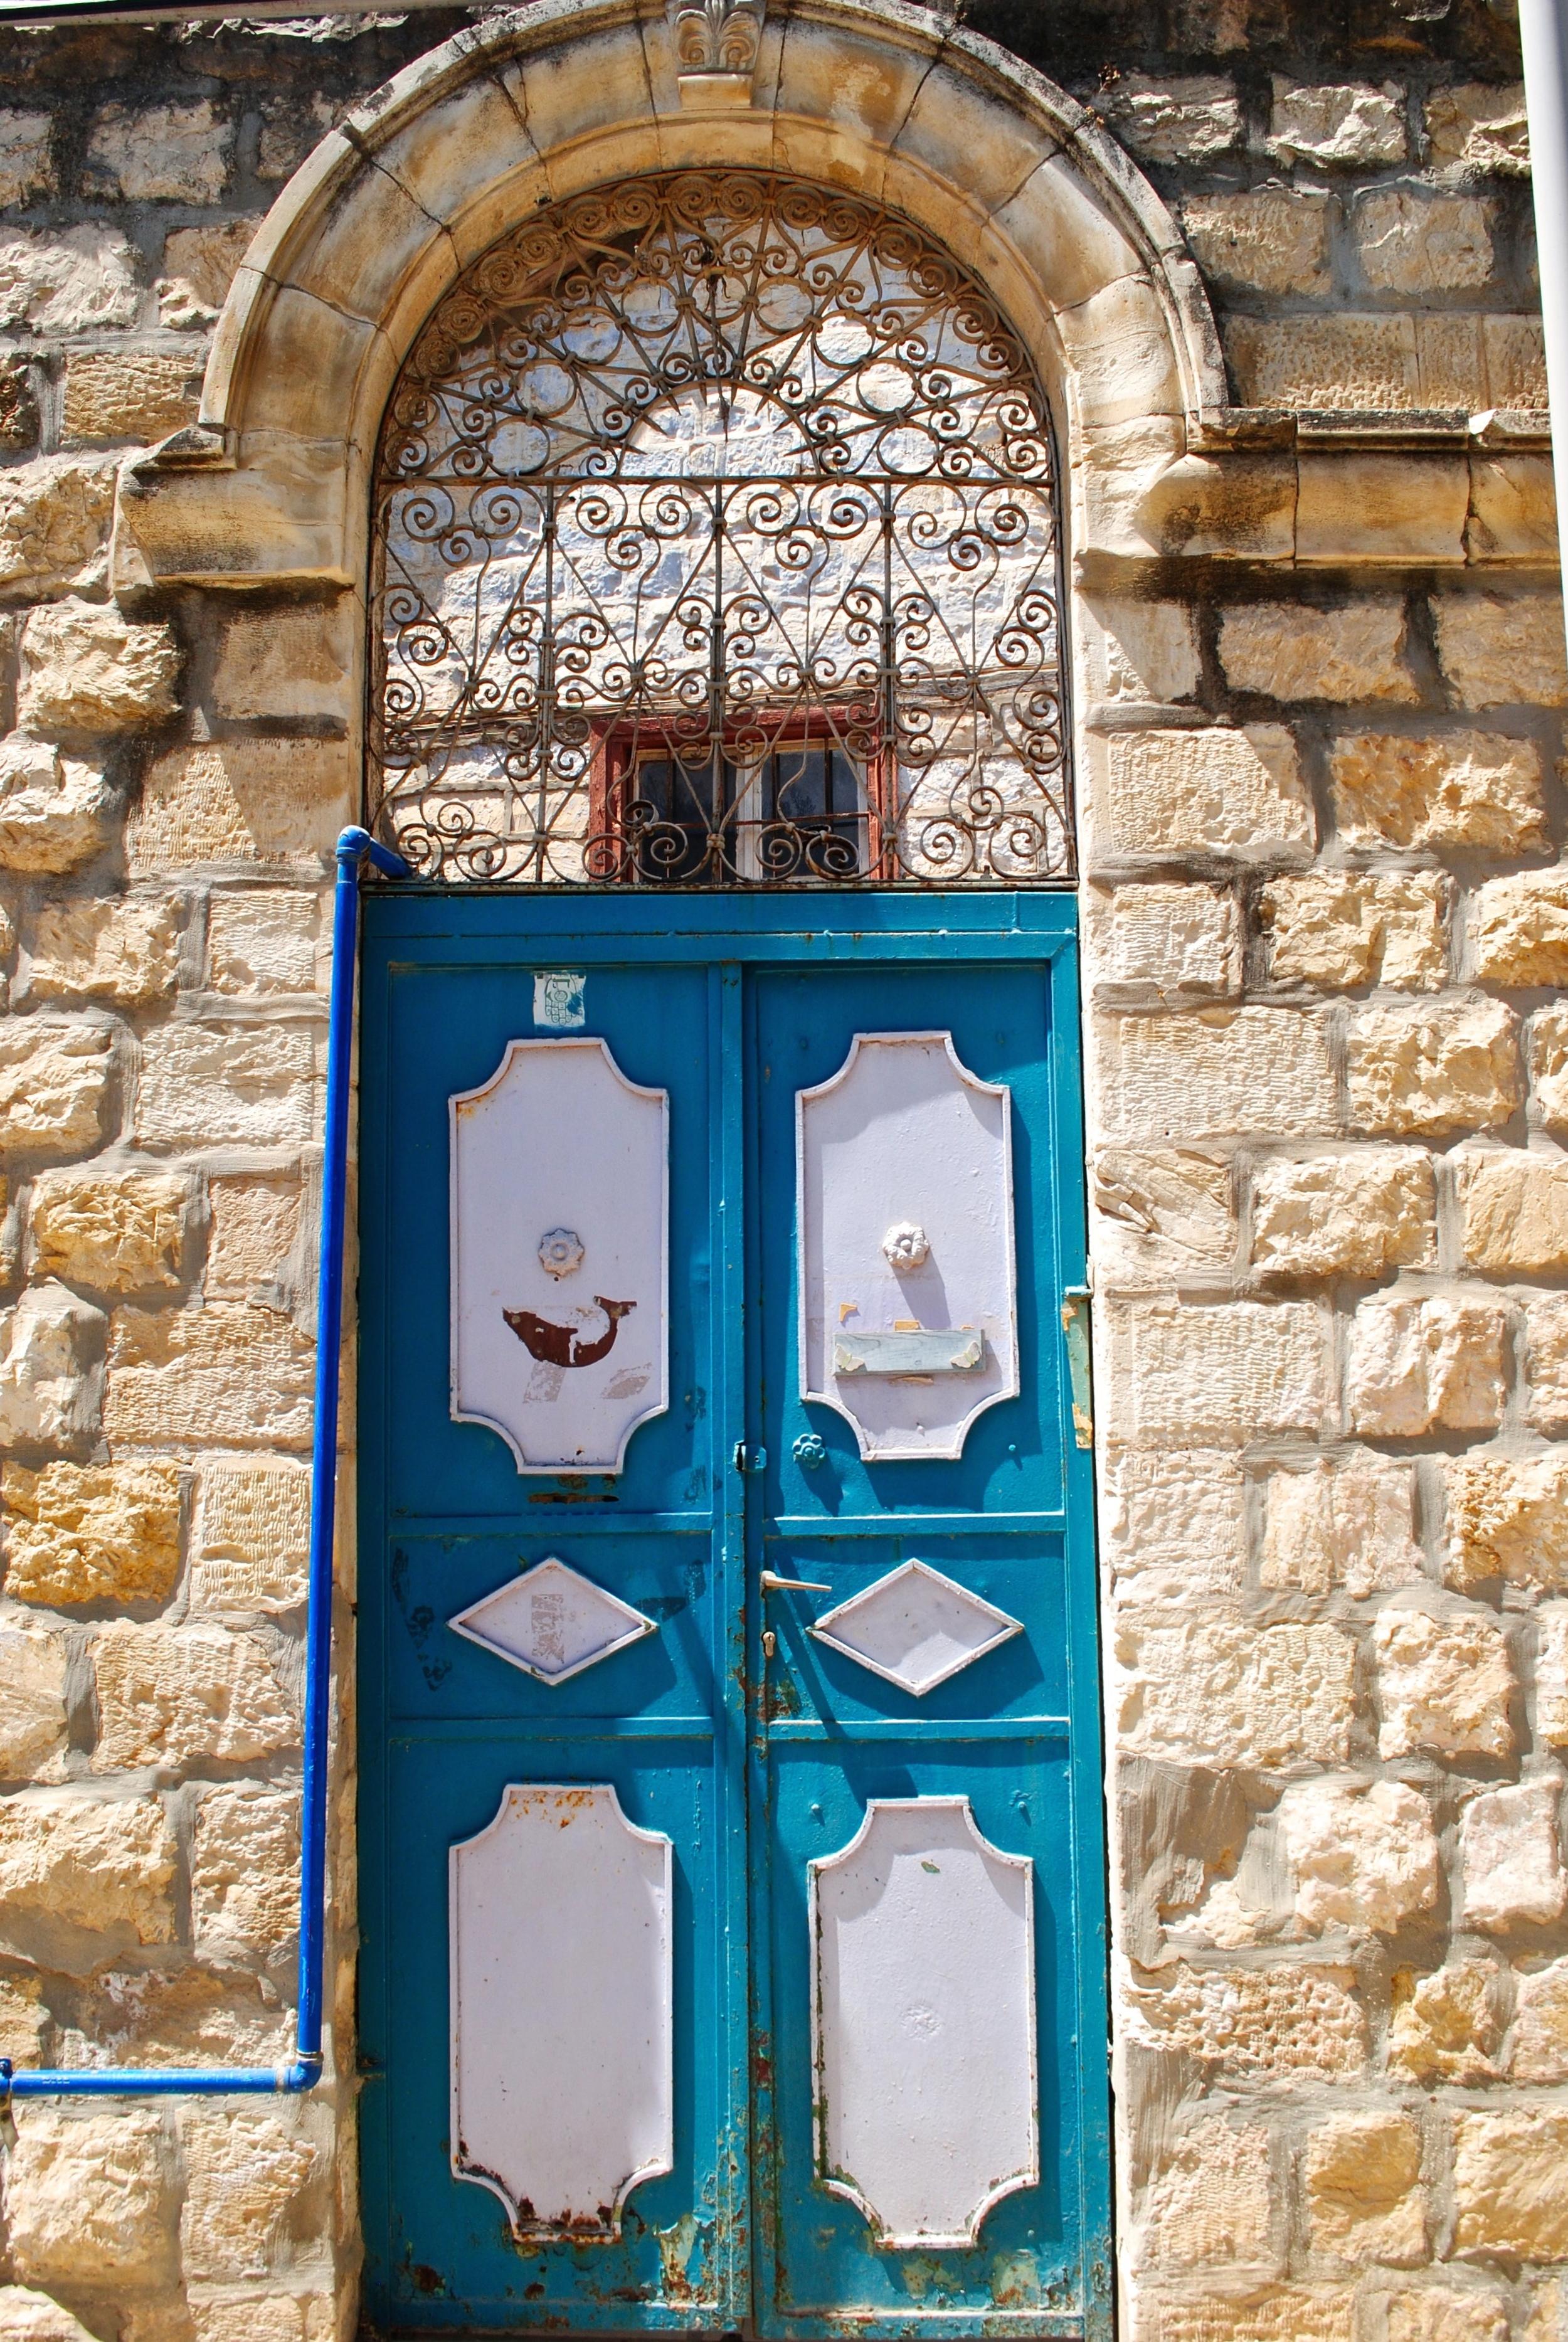 Turquoise Tsfat Door , Tsaft Israel, August 2015